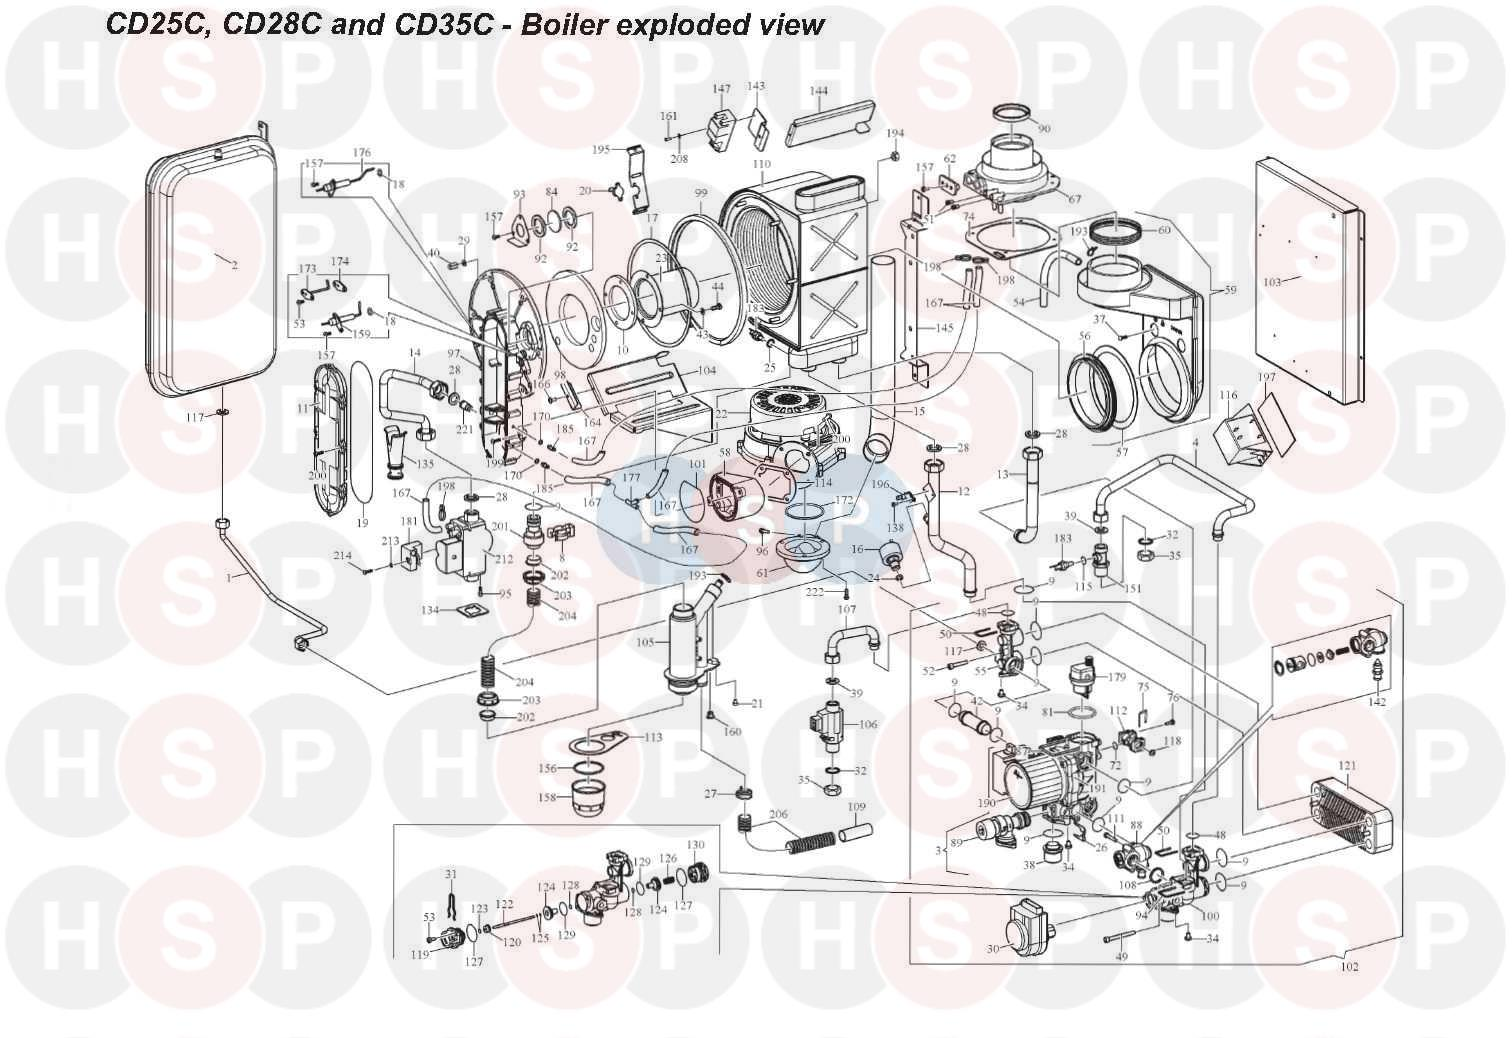 BOILER ASSEMBLY diagram for Alpha CD28C